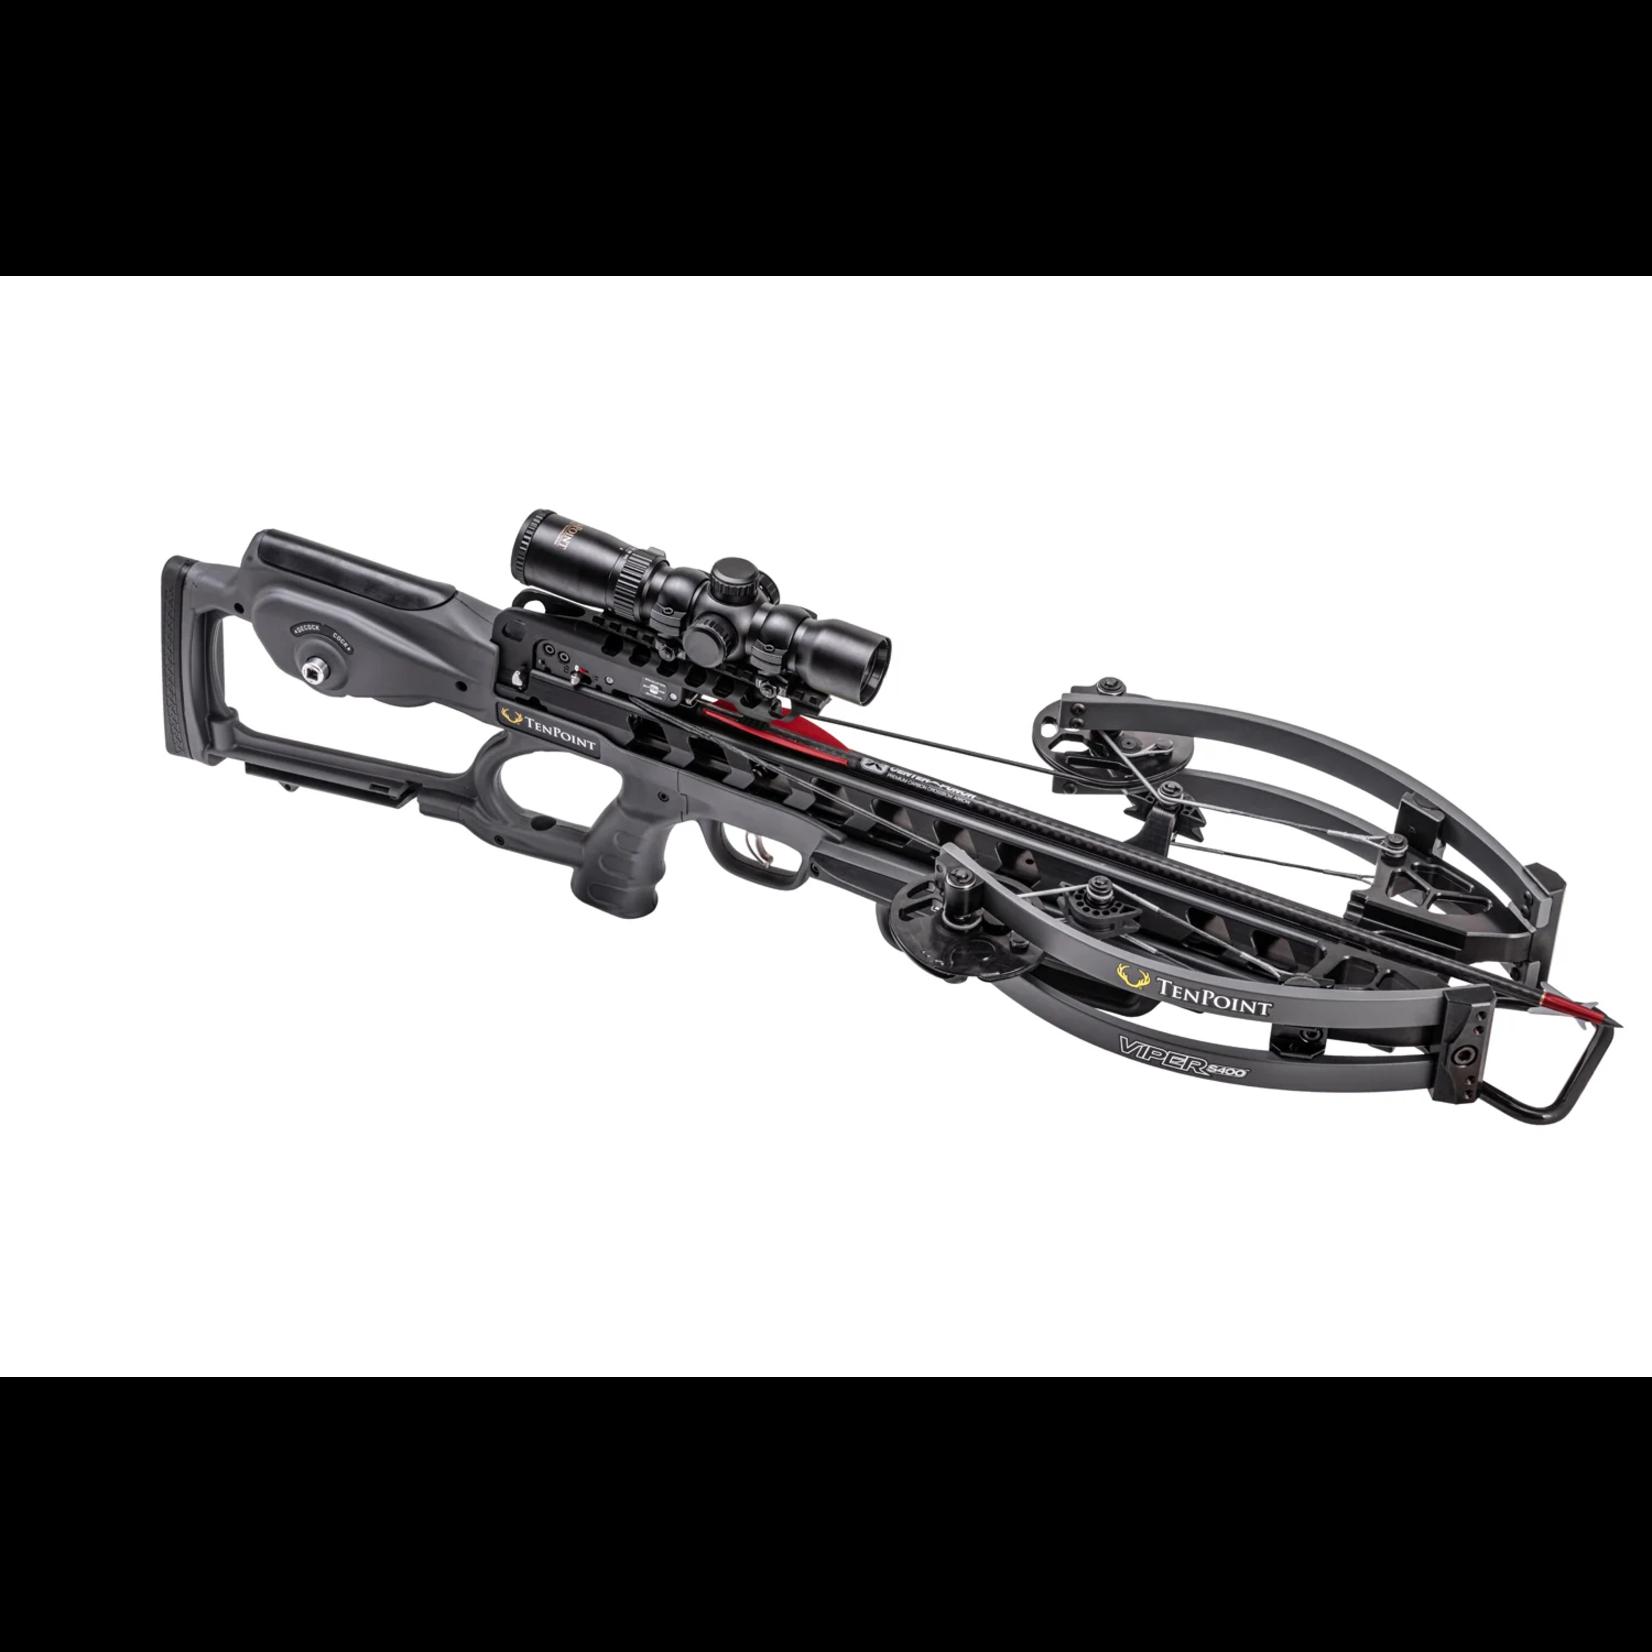 Tenpoint Viper S400 Crossbow Graphite